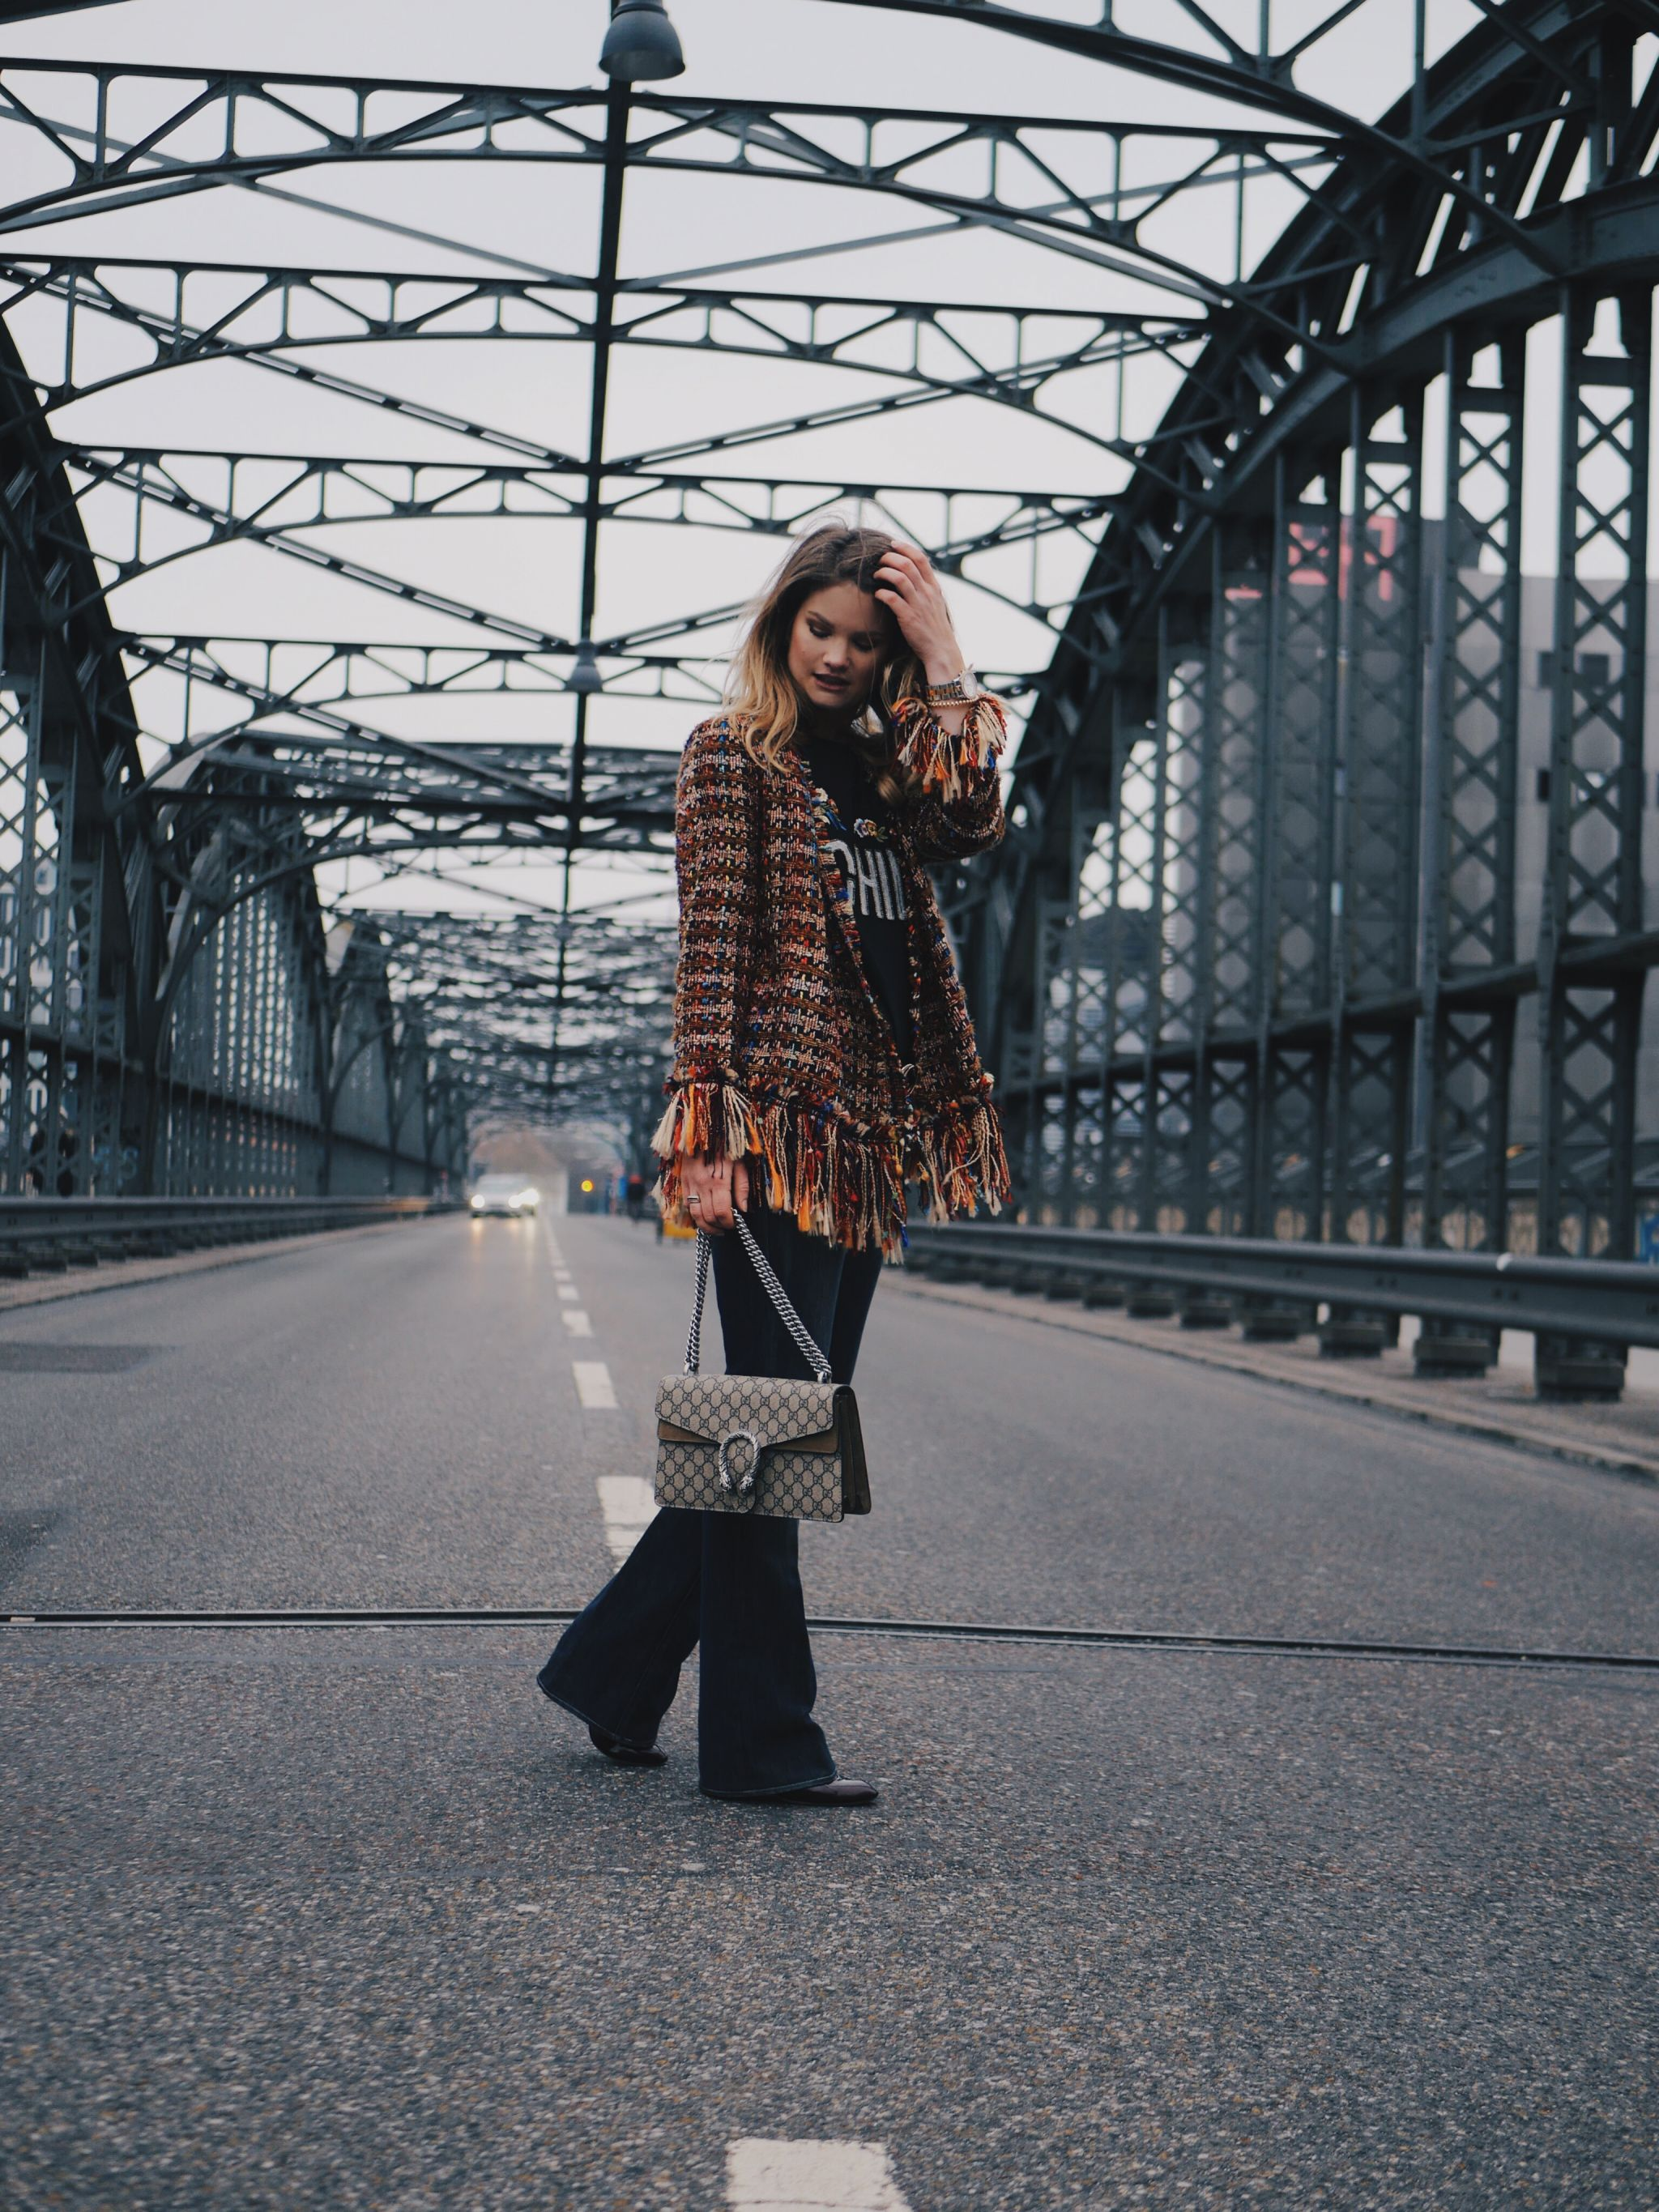 Modern Boho Chic – Coloured Fringe Jacket meets Gucci Dionysus